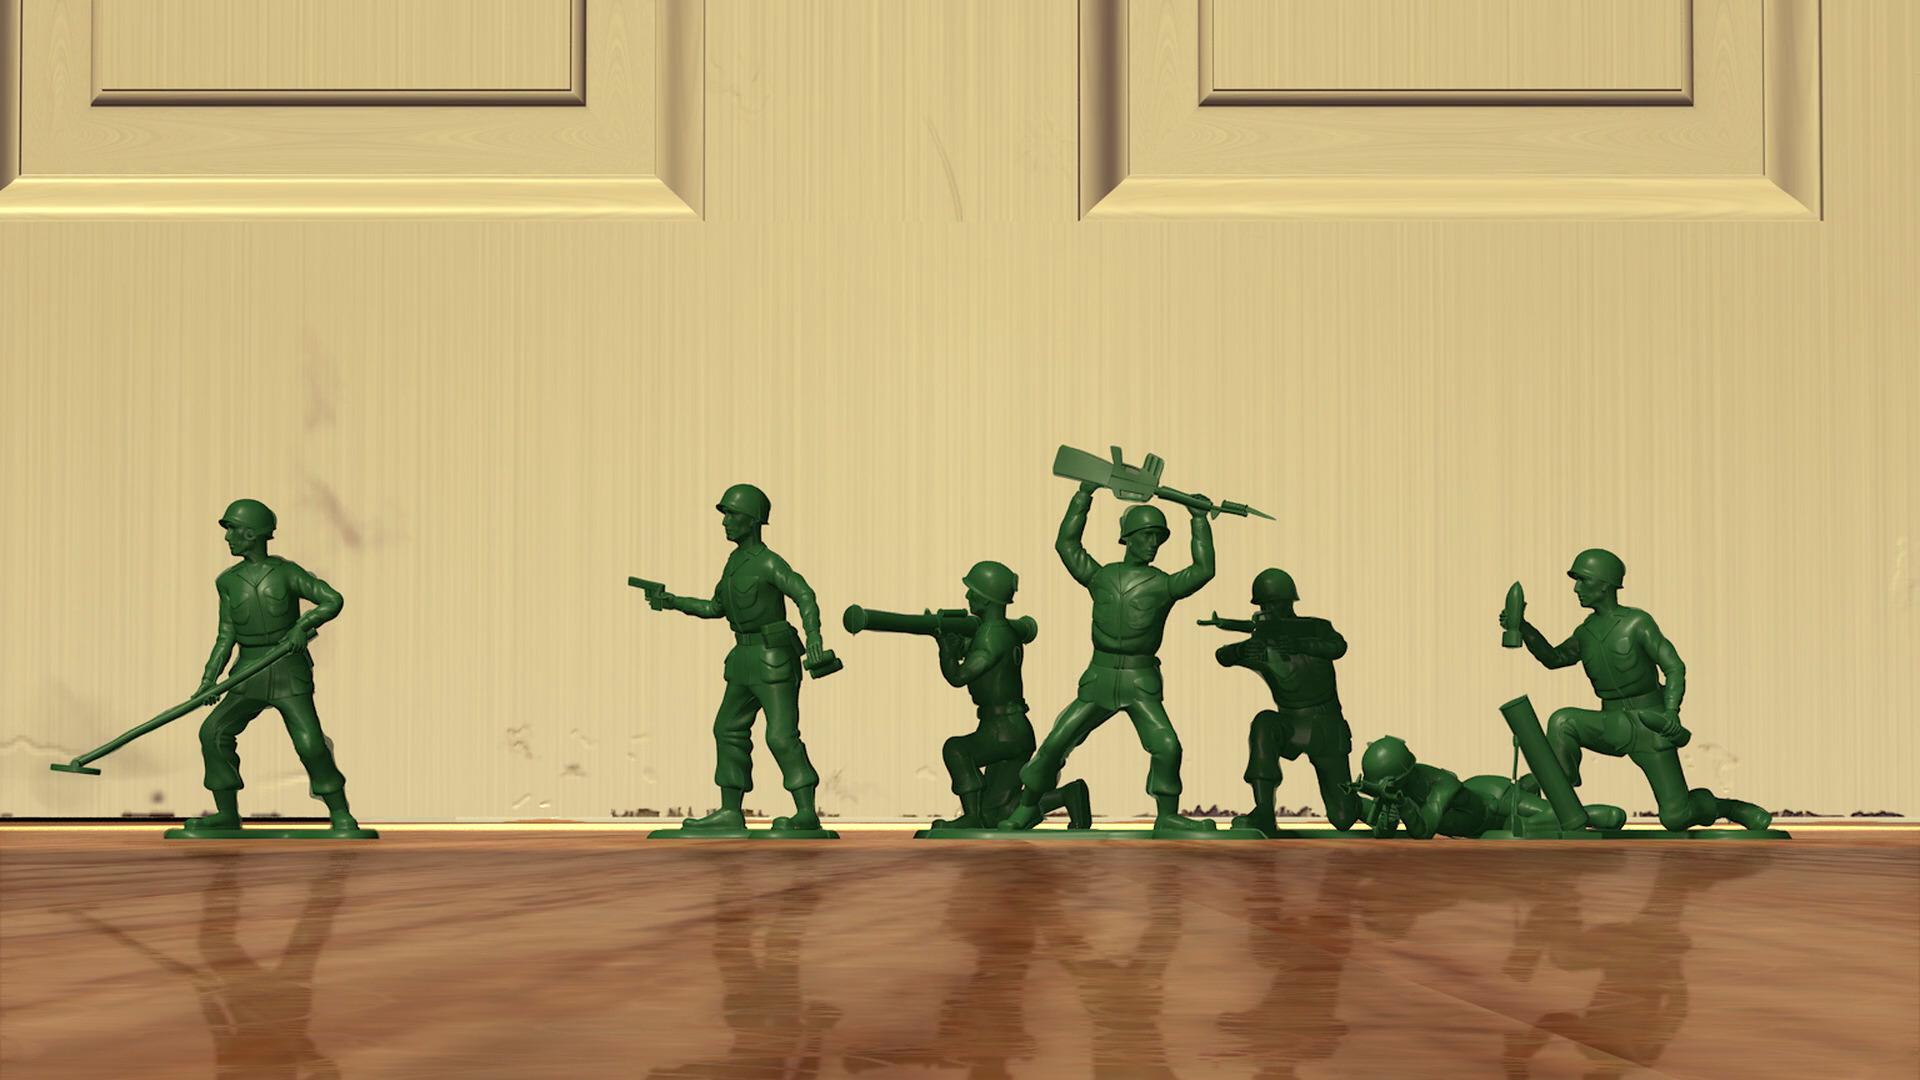 sergent soldat vert personnage toy story 04